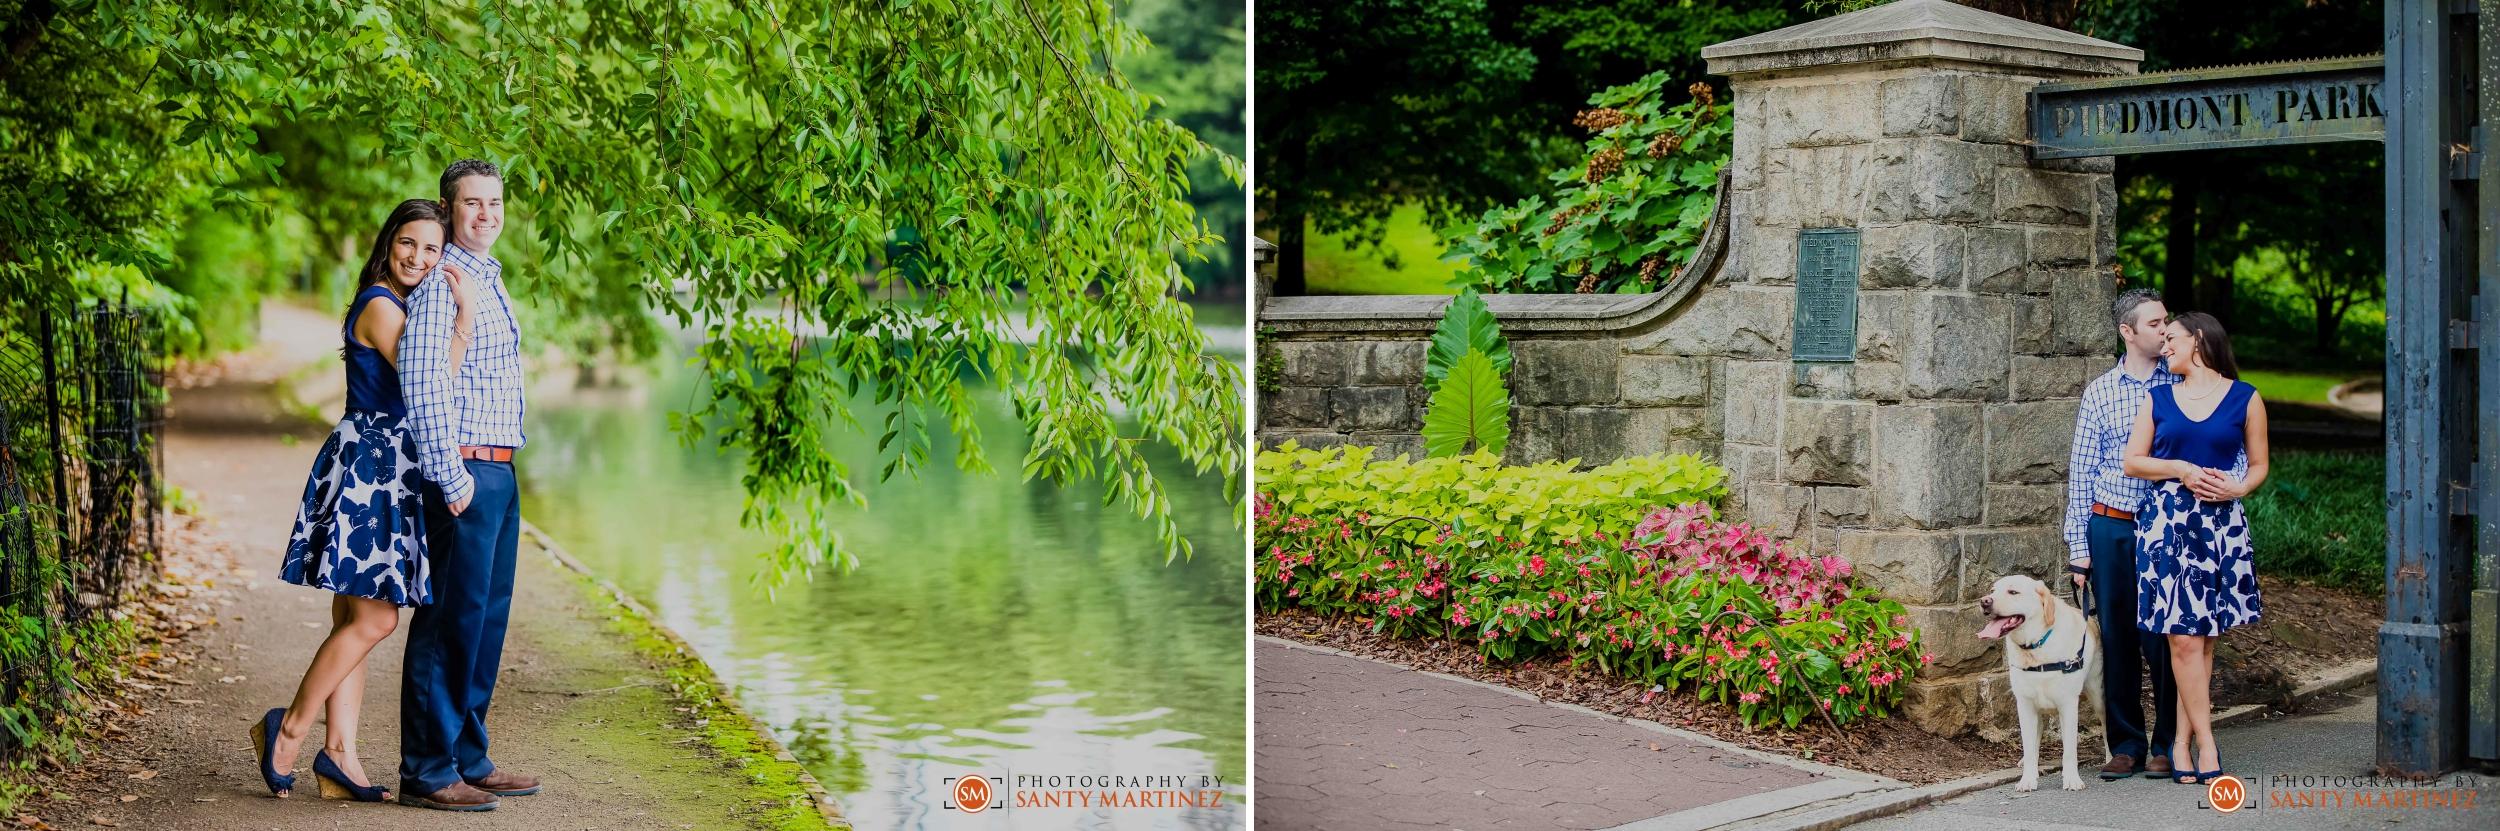 Engagement Session Piedmont Park - Santy Martinez Photography 6.jpg